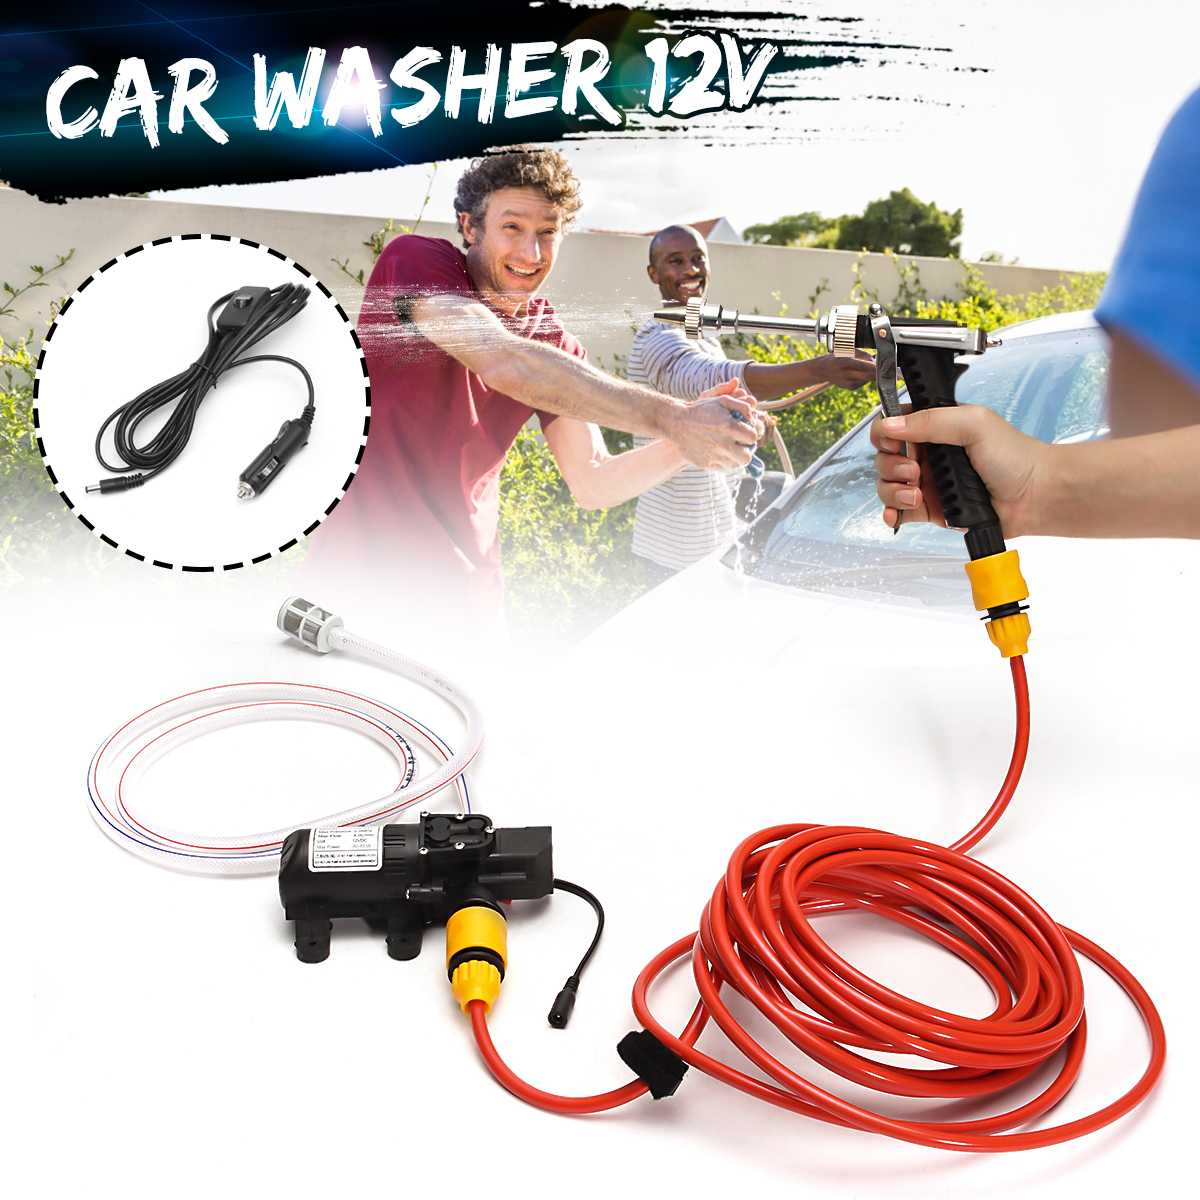 Portable High Pressure Mini Car Washing Machine Home Type High Pressure Diaphragm Water Self-priming Car Wash Pump With Kits